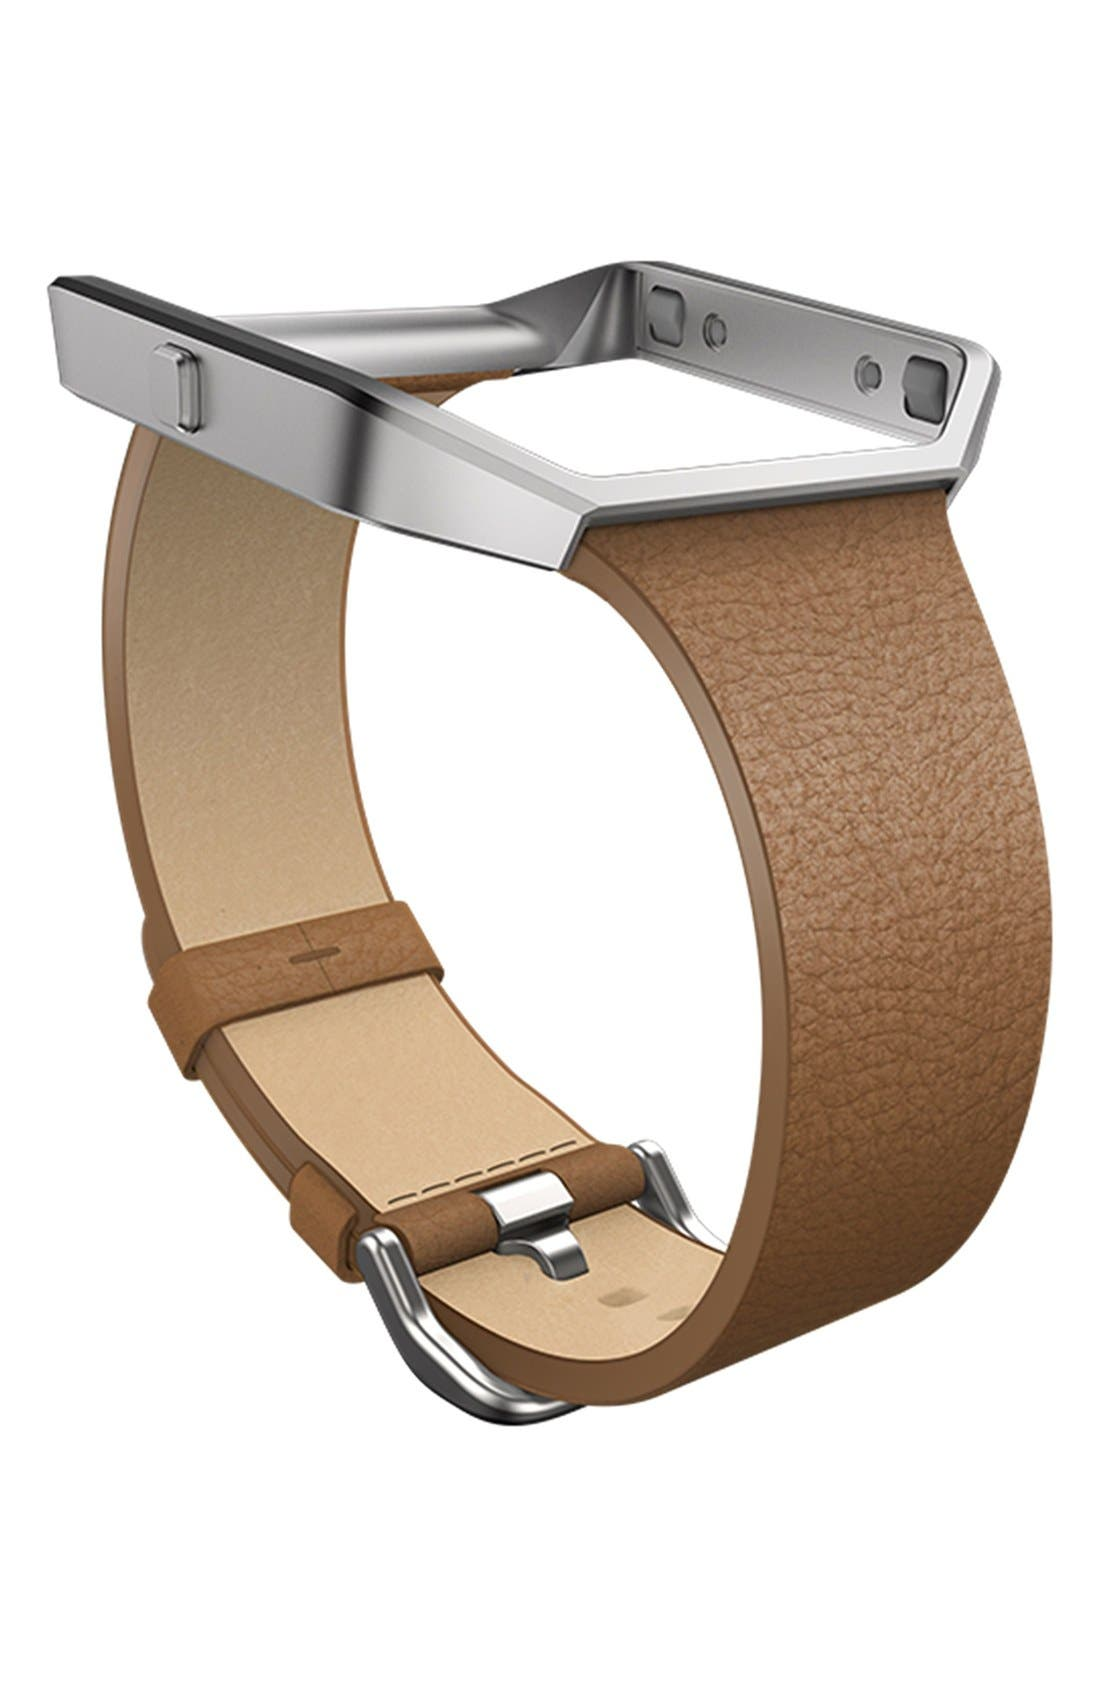 'Blaze' Slim Leather Accessory Band & Frame,                         Main,                         color, CAMEL